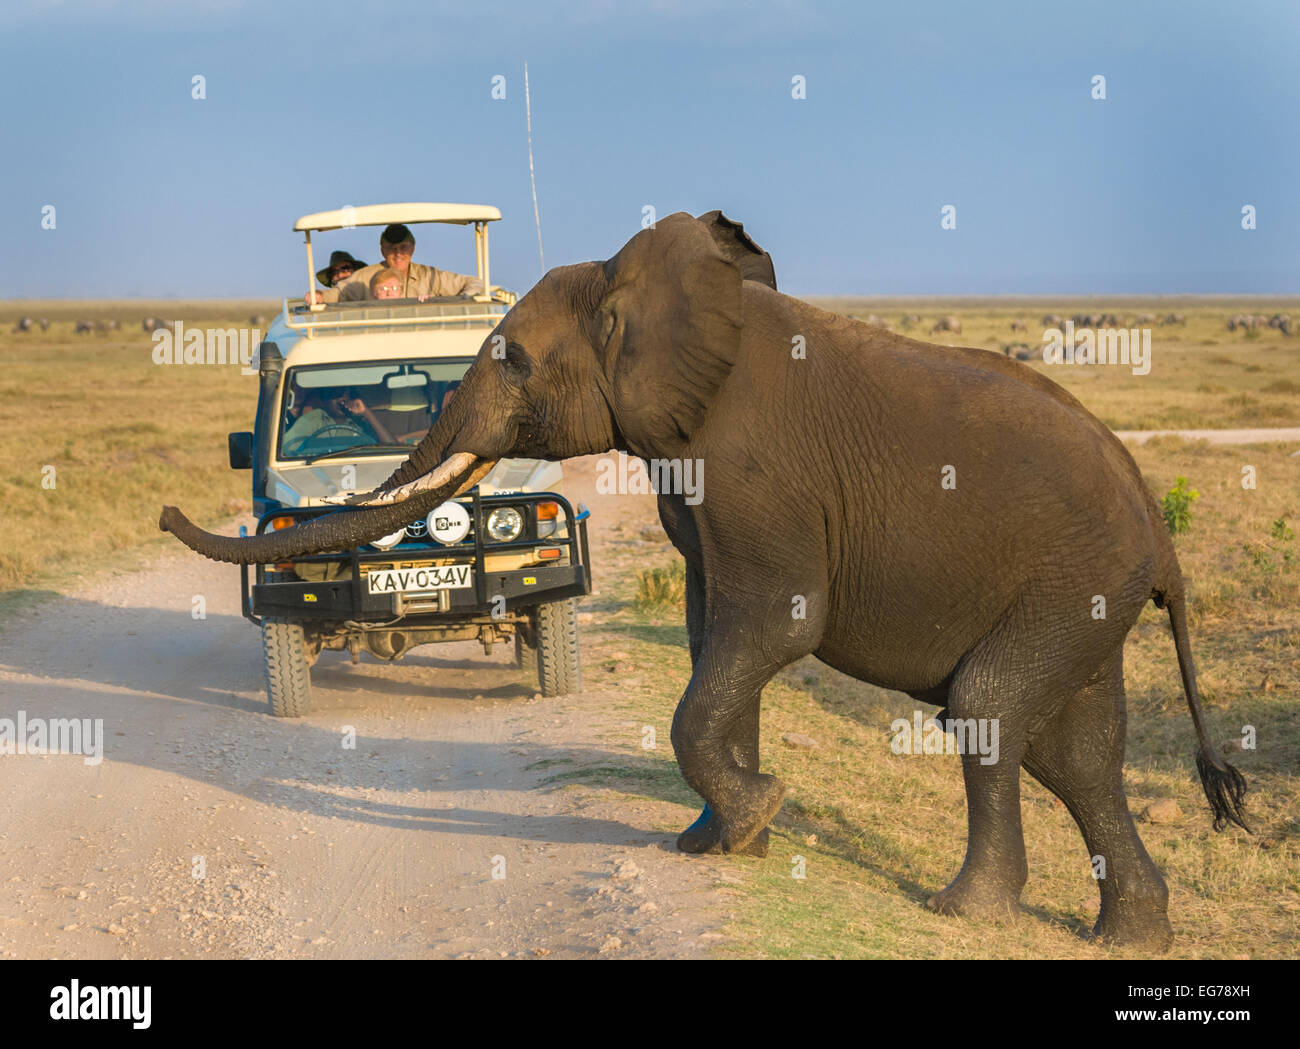 AMBOSELI, KENYA - September, 18, 2008: Elephant safari in Amboseli National Park, Kenya - Stock Image